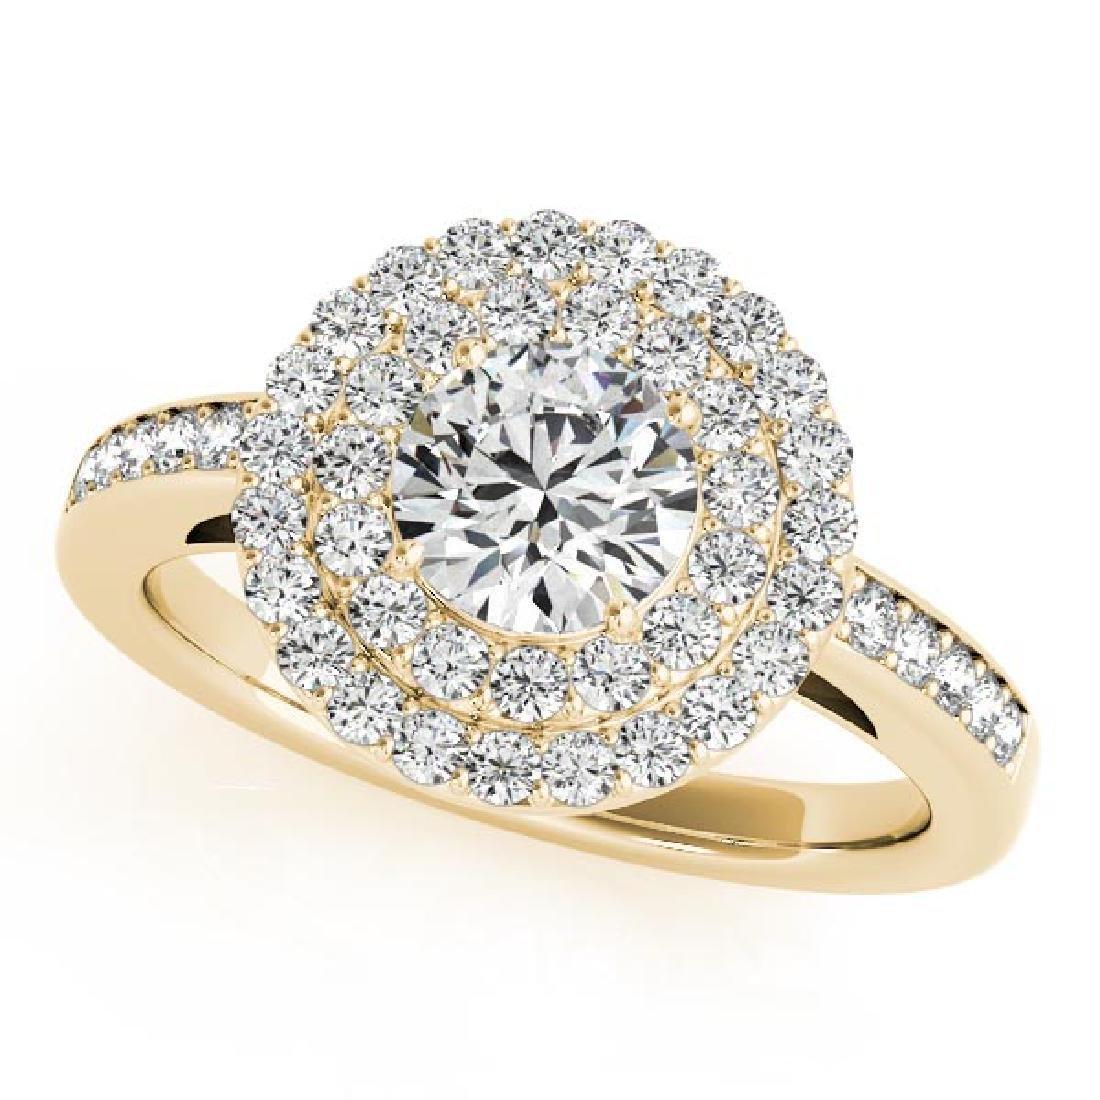 CERTIFIED 18K YELLOW GOLD 1.30 CT G-H/VS-SI1 DIAMOND HA